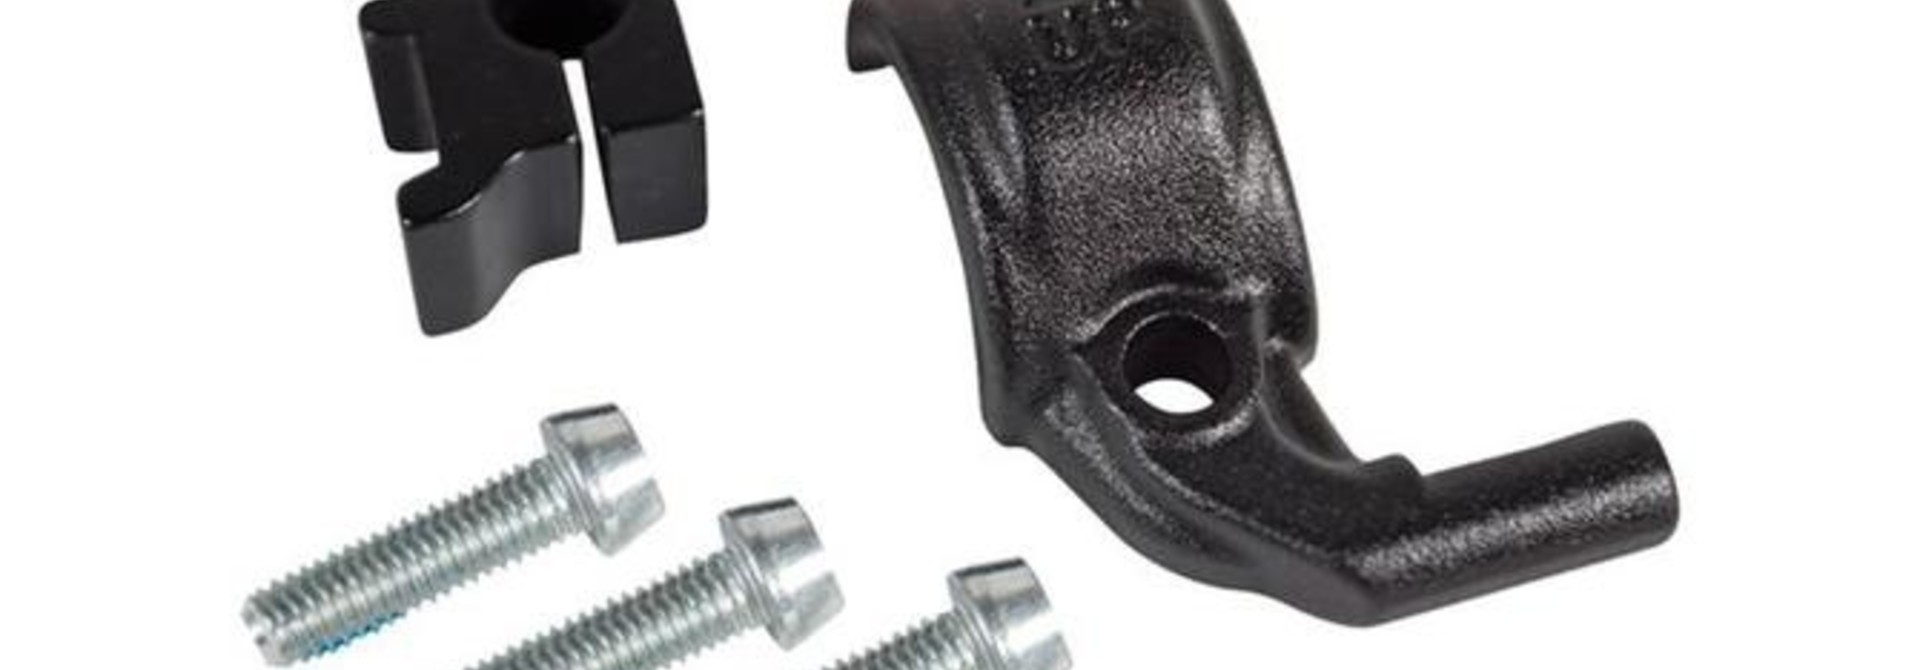 Formula C1/Cura Matchmaker clamp for SRAM shifter